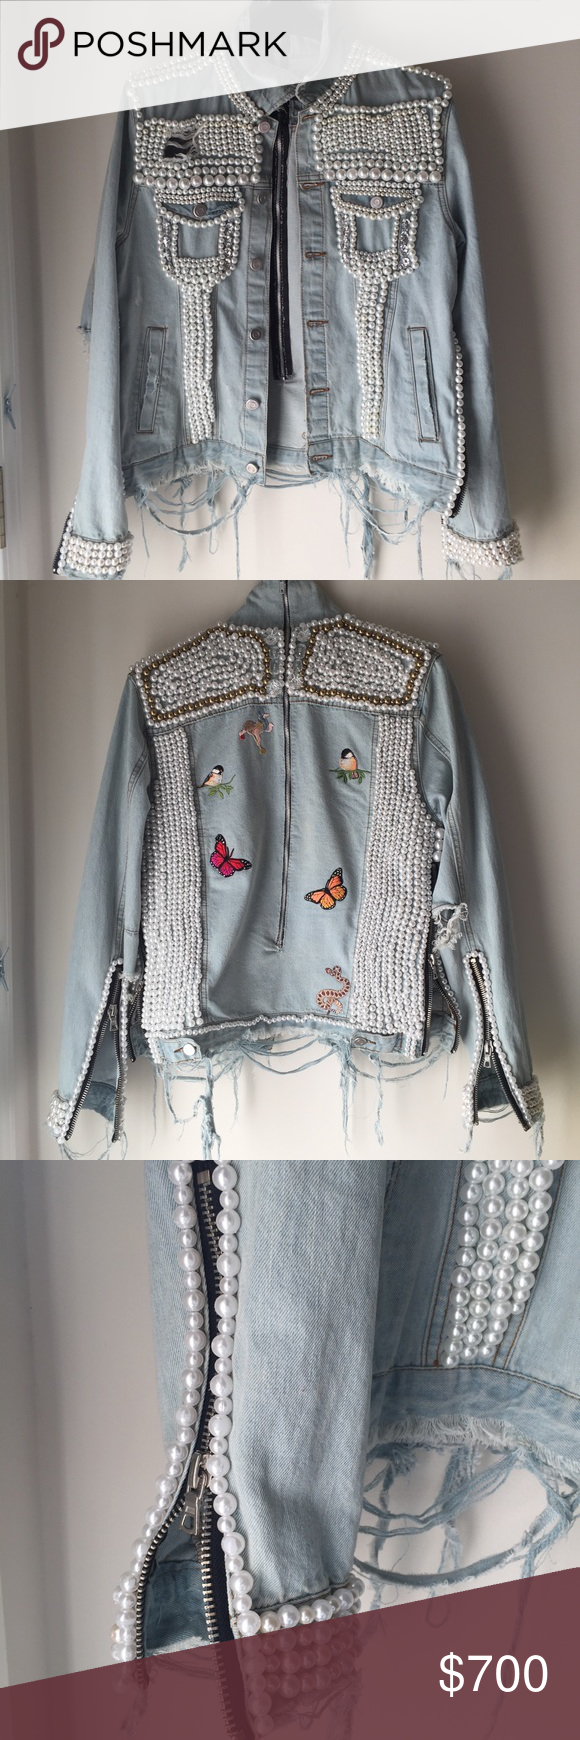 Denim Pearl Jacket Custom 3500 Pearl Denim Jacket 600 On Anything Else Balmain Jackets Coats Jean Jackets Embellished Denim Fashion Denim And Lace [ 1740 x 580 Pixel ]